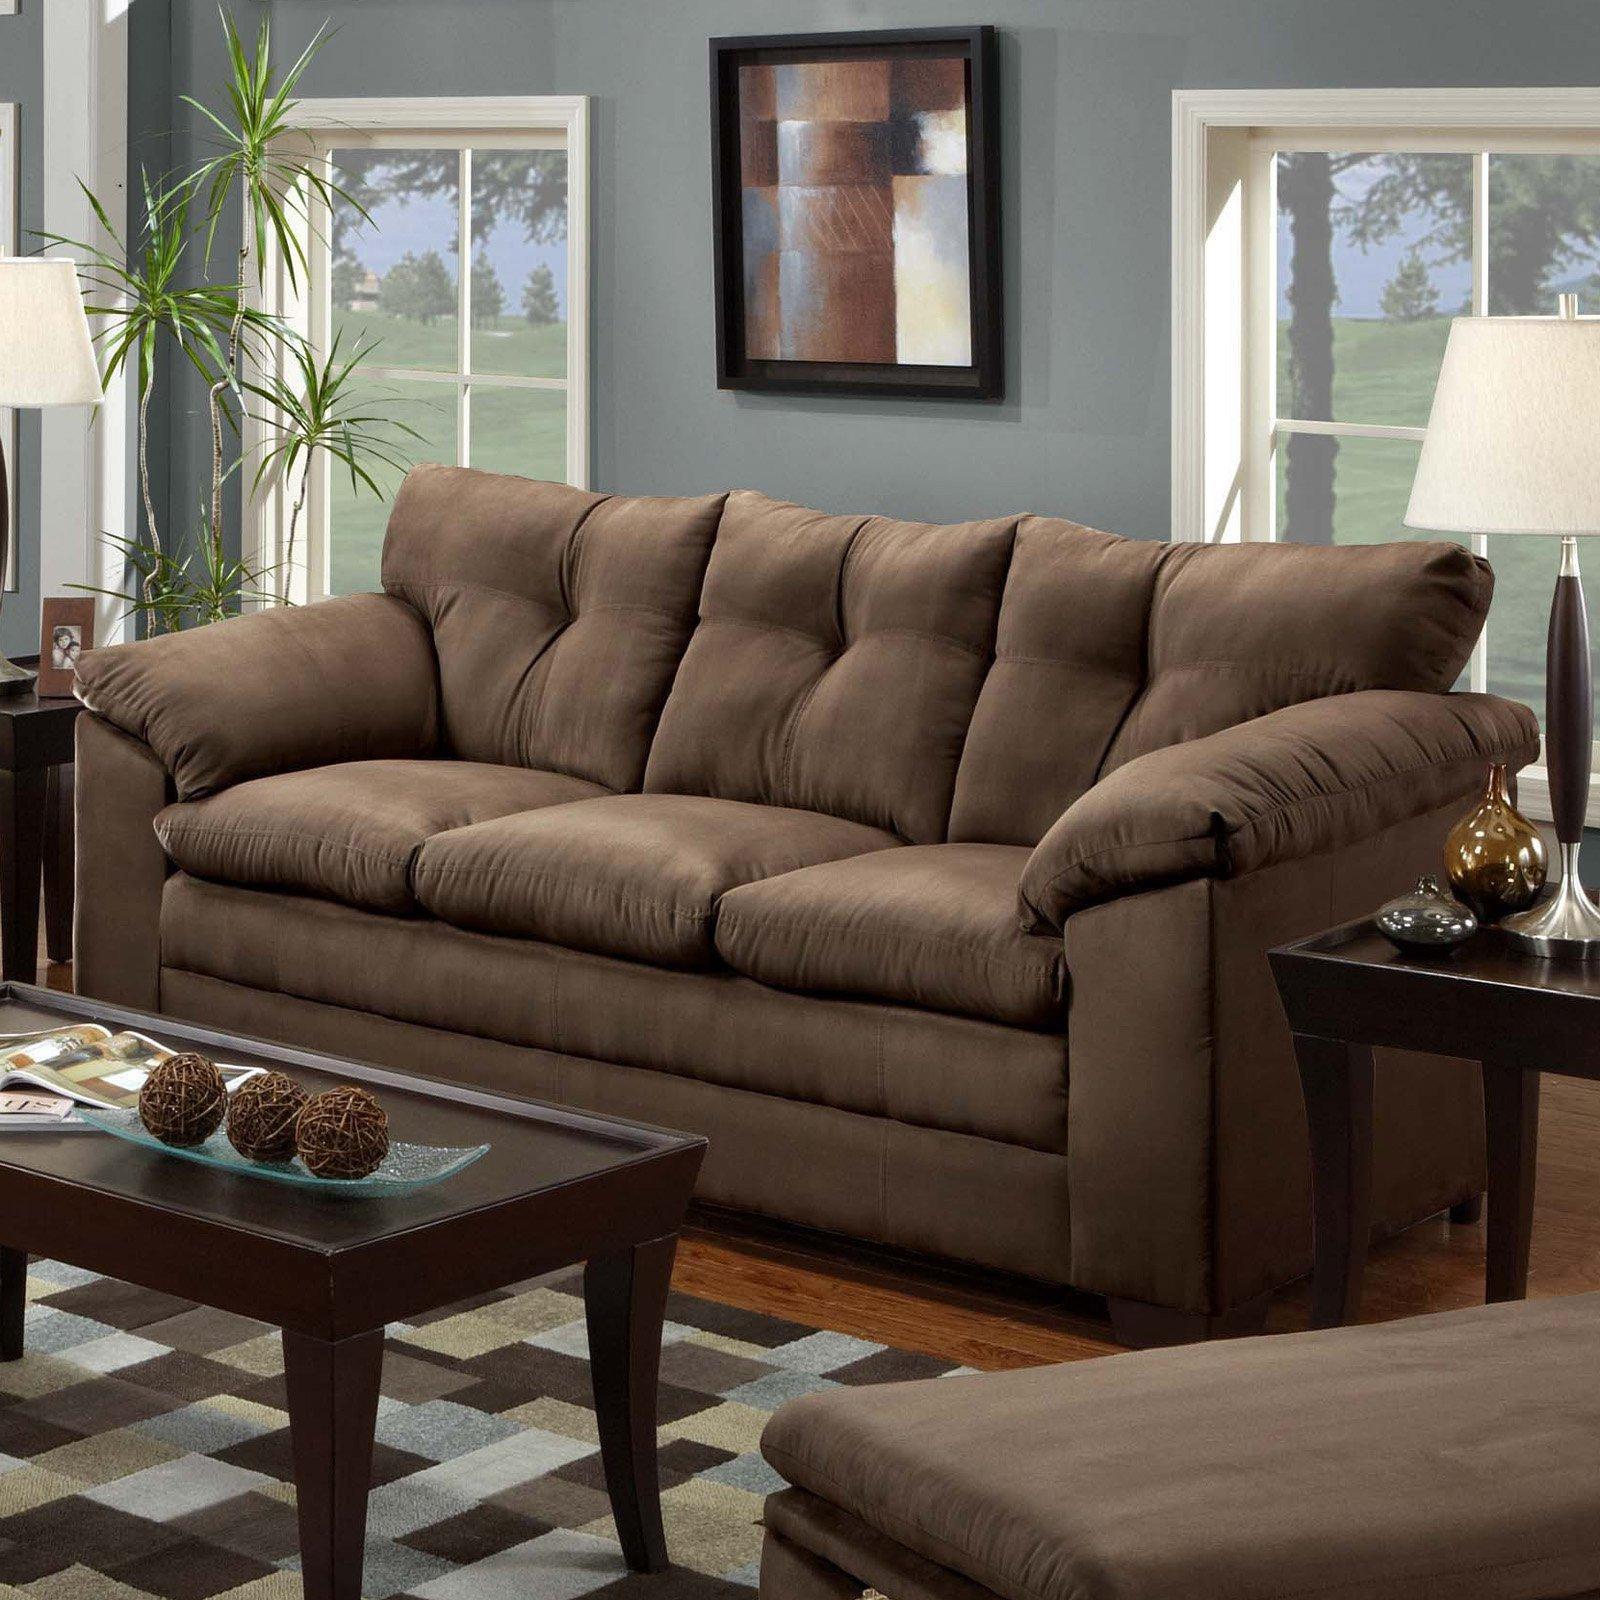 Simmons Luna Chocolate Microfiber Sofa – Walmart Pertaining To Simmons Microfiber Sofas (Image 7 of 20)